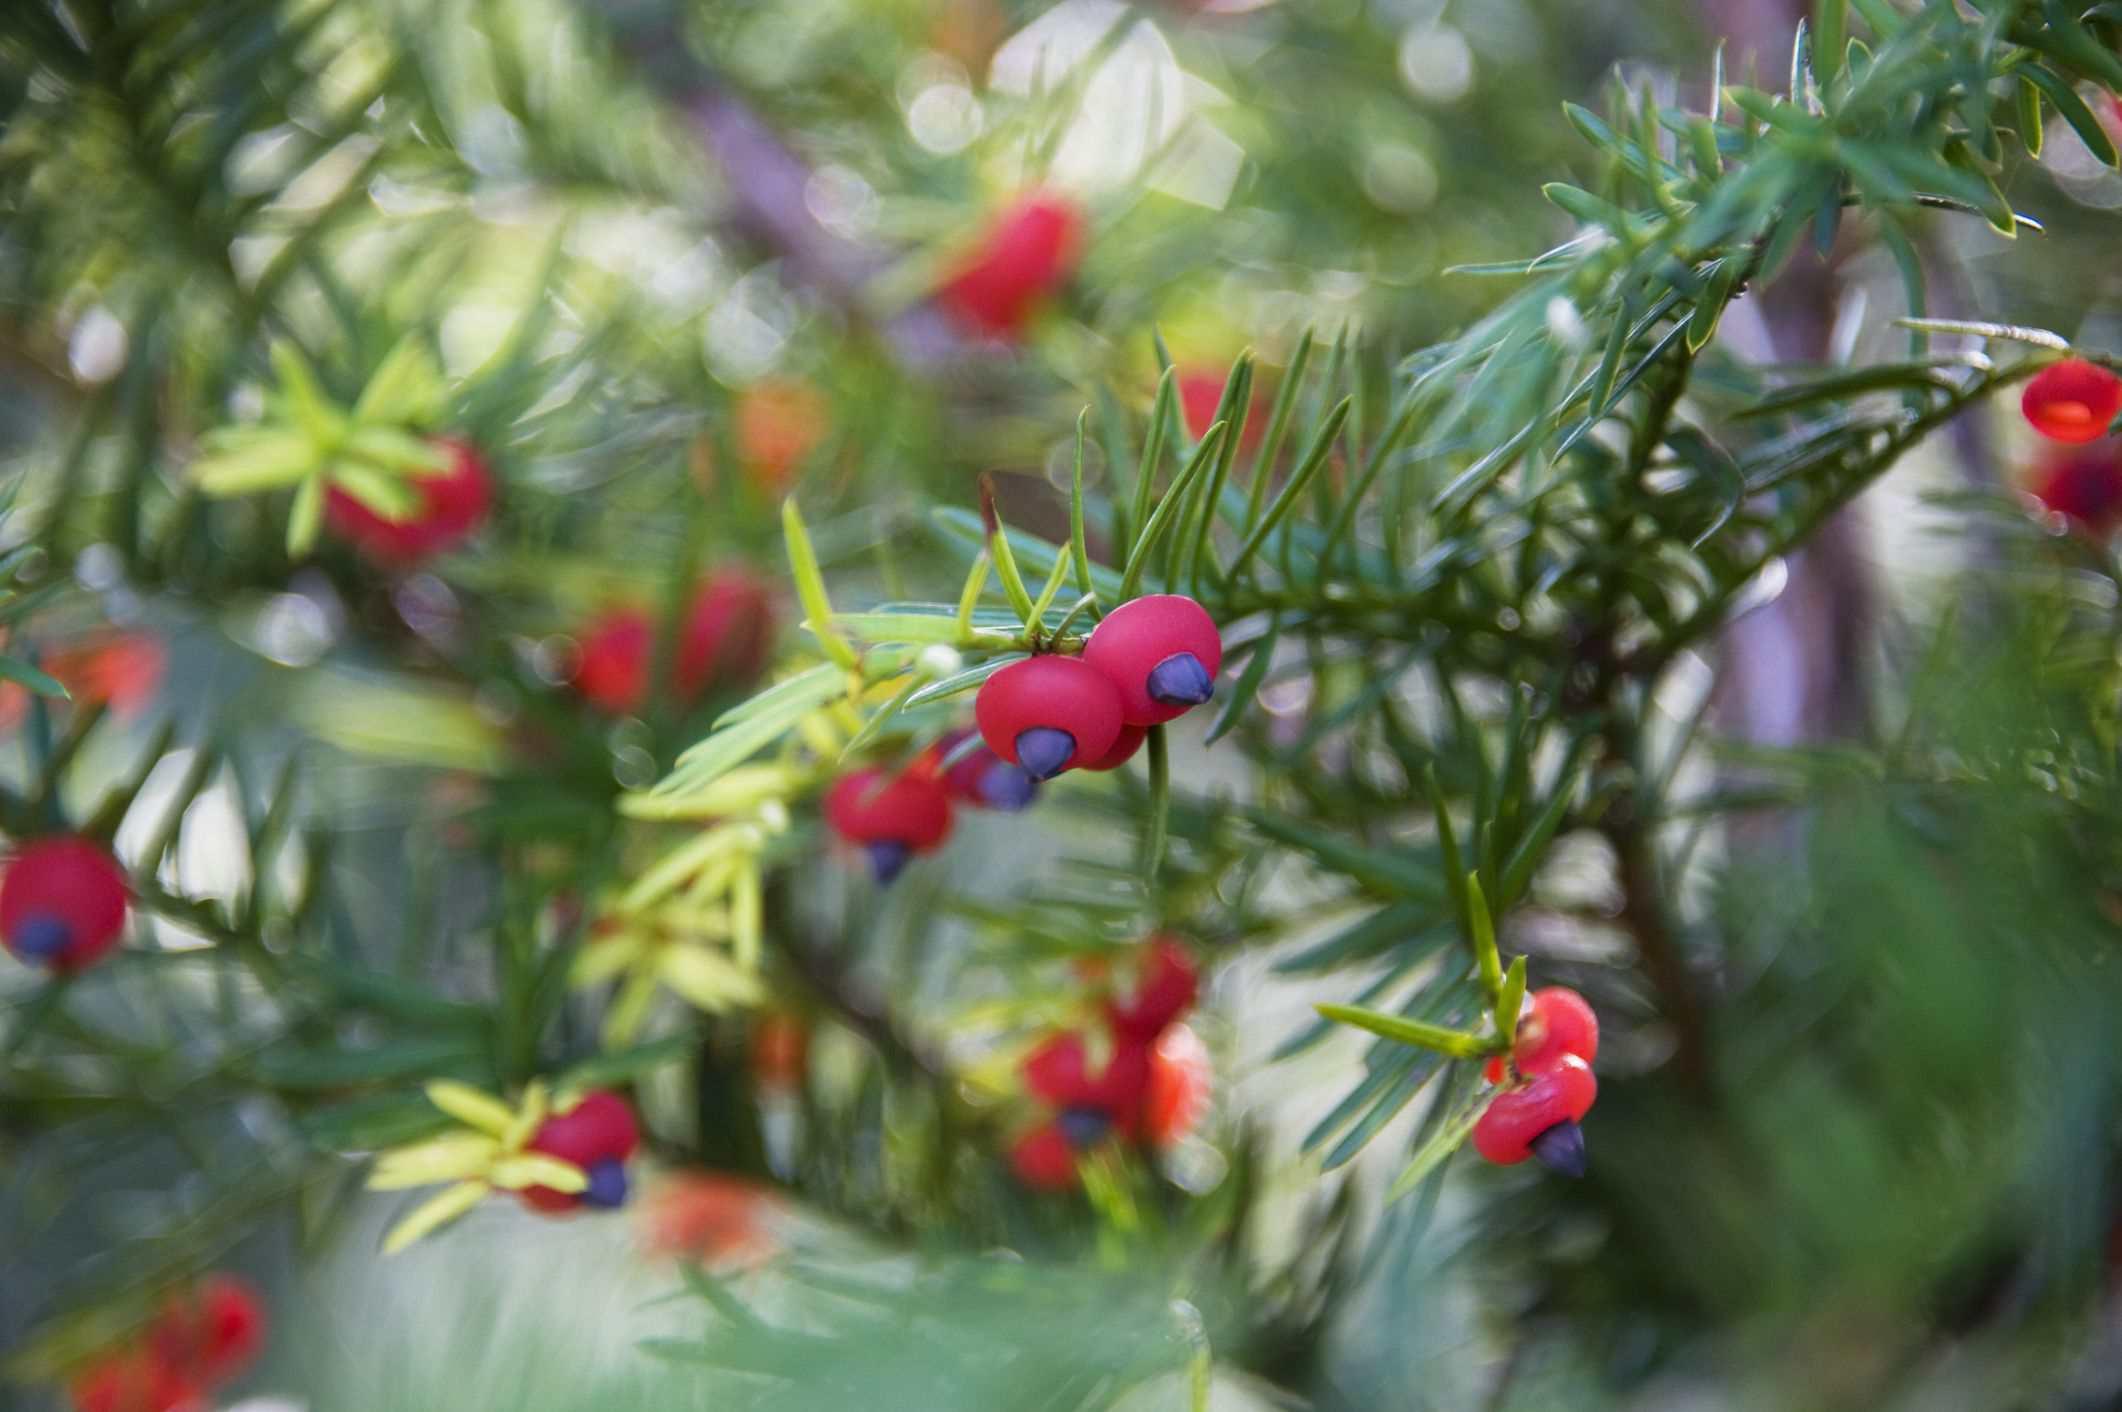 Berries of a yew bush